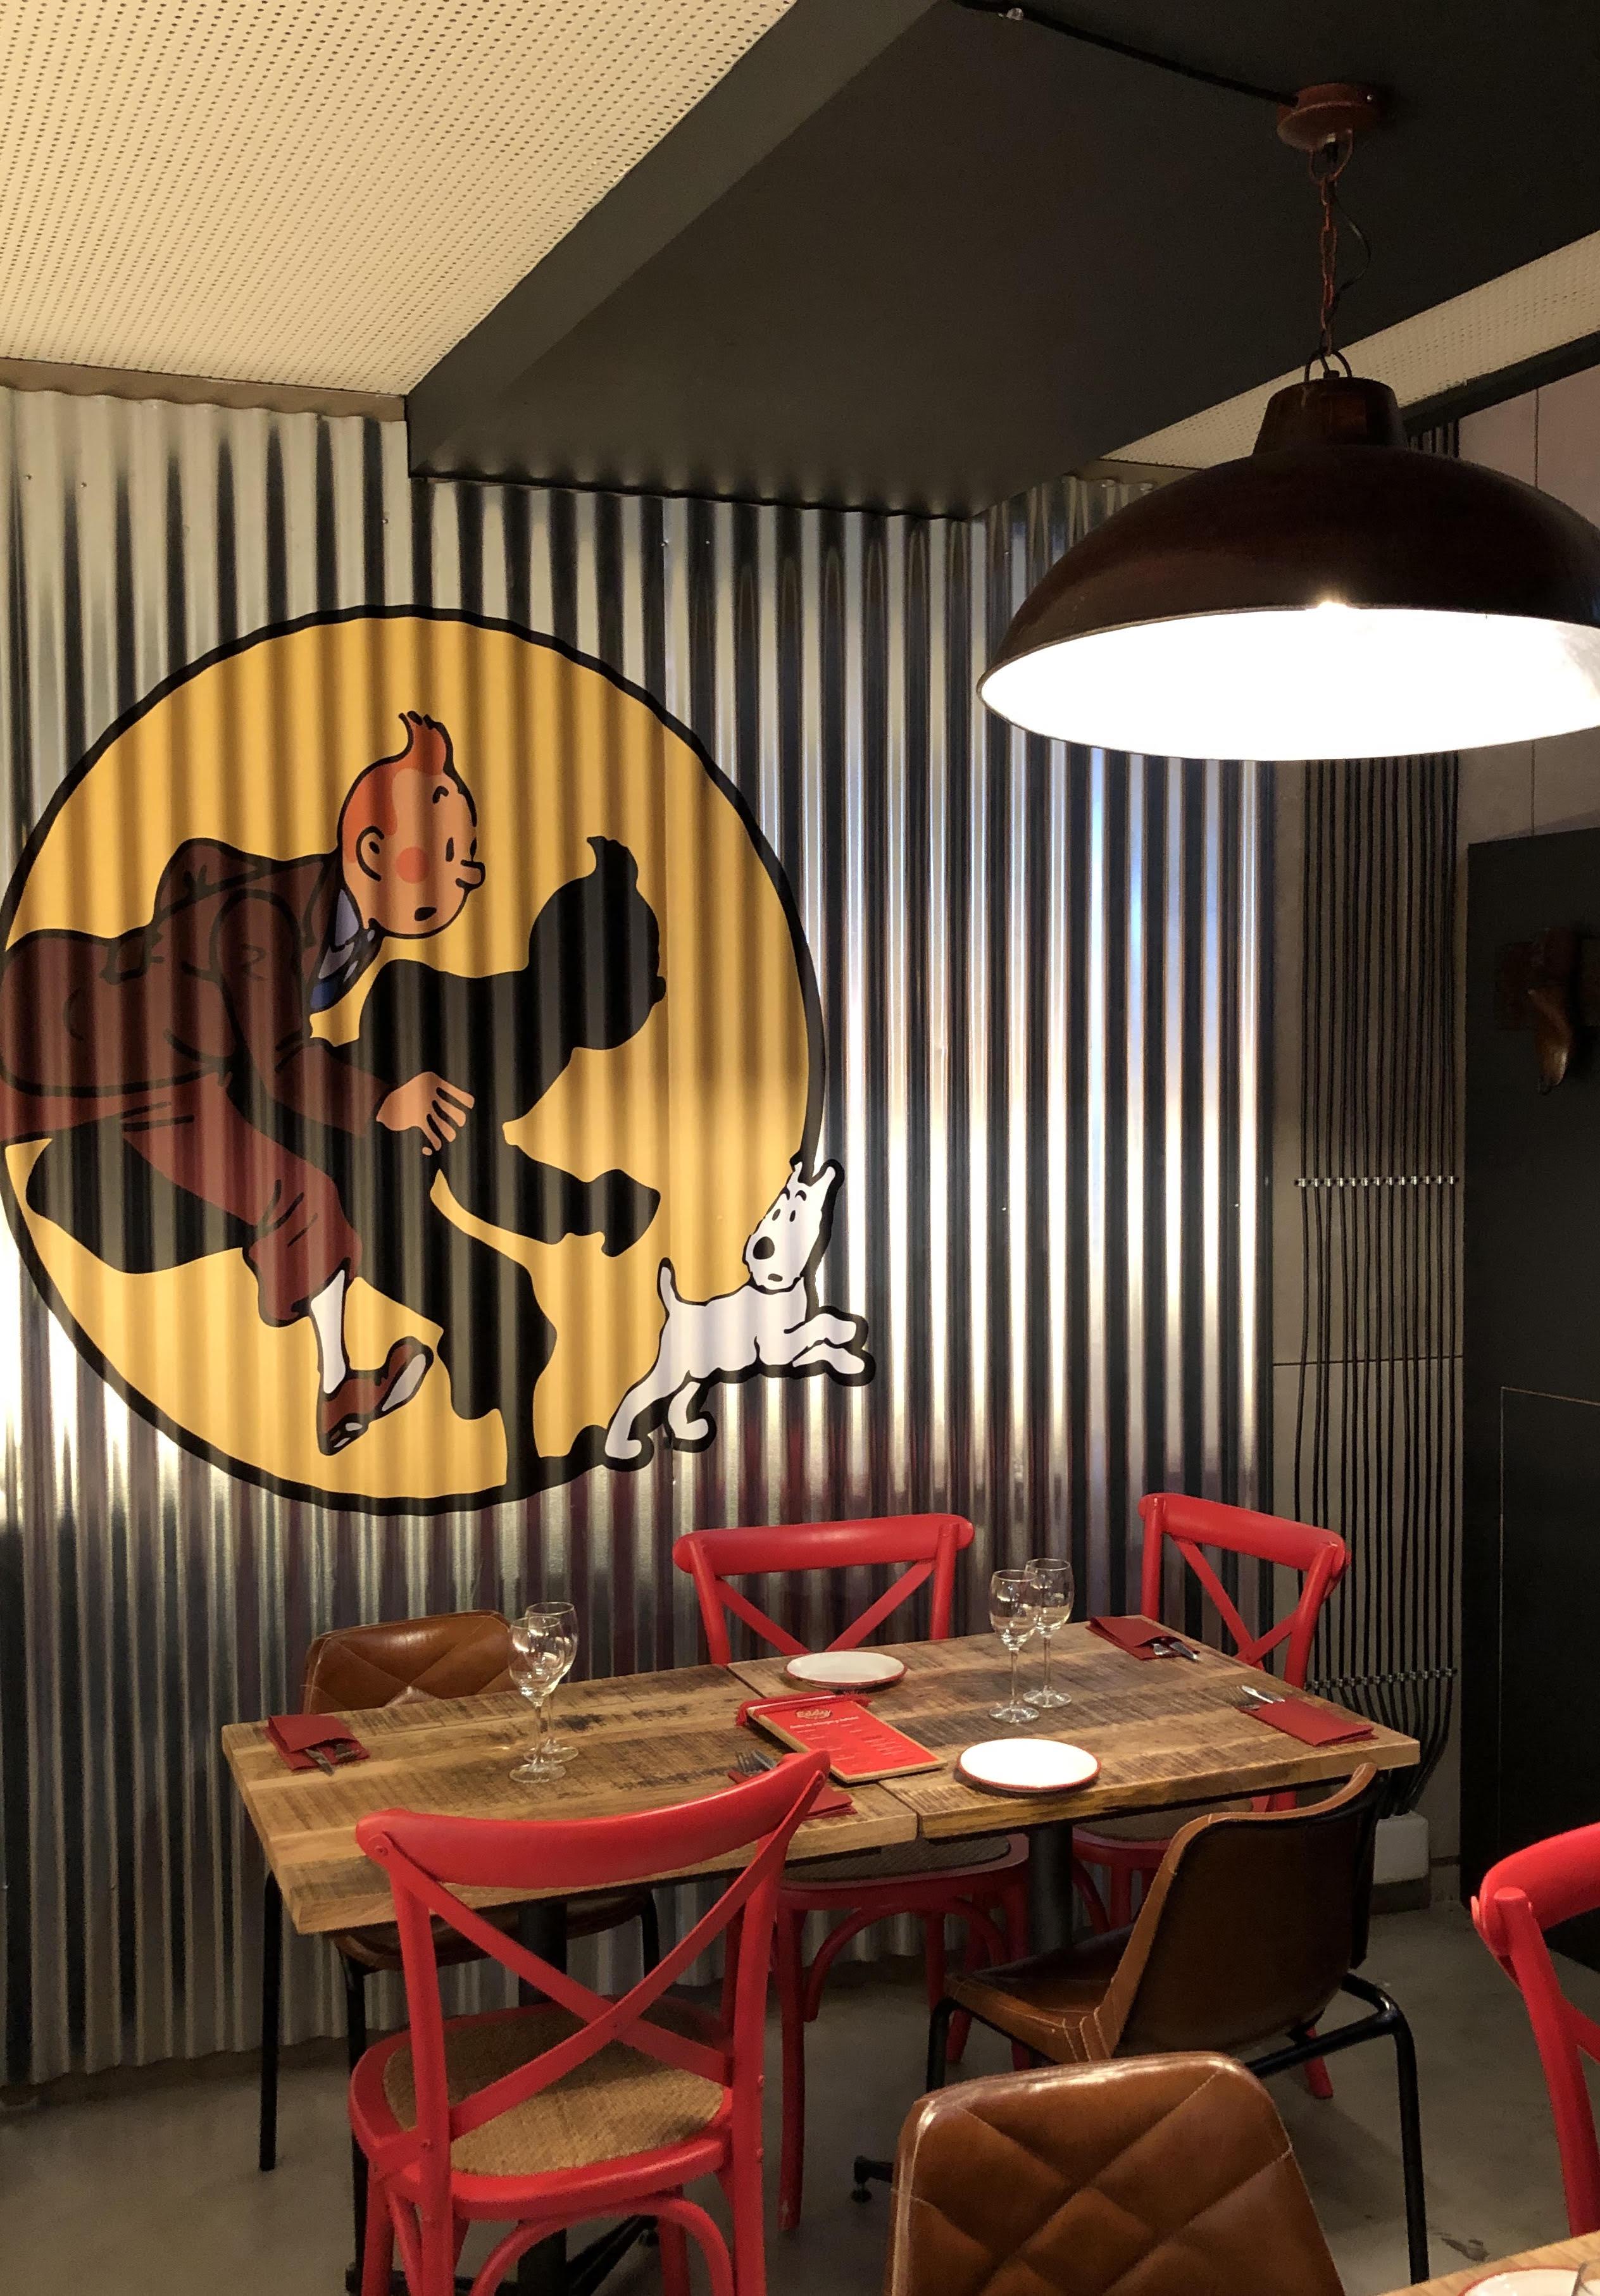 eddy restaurante belga valladolid